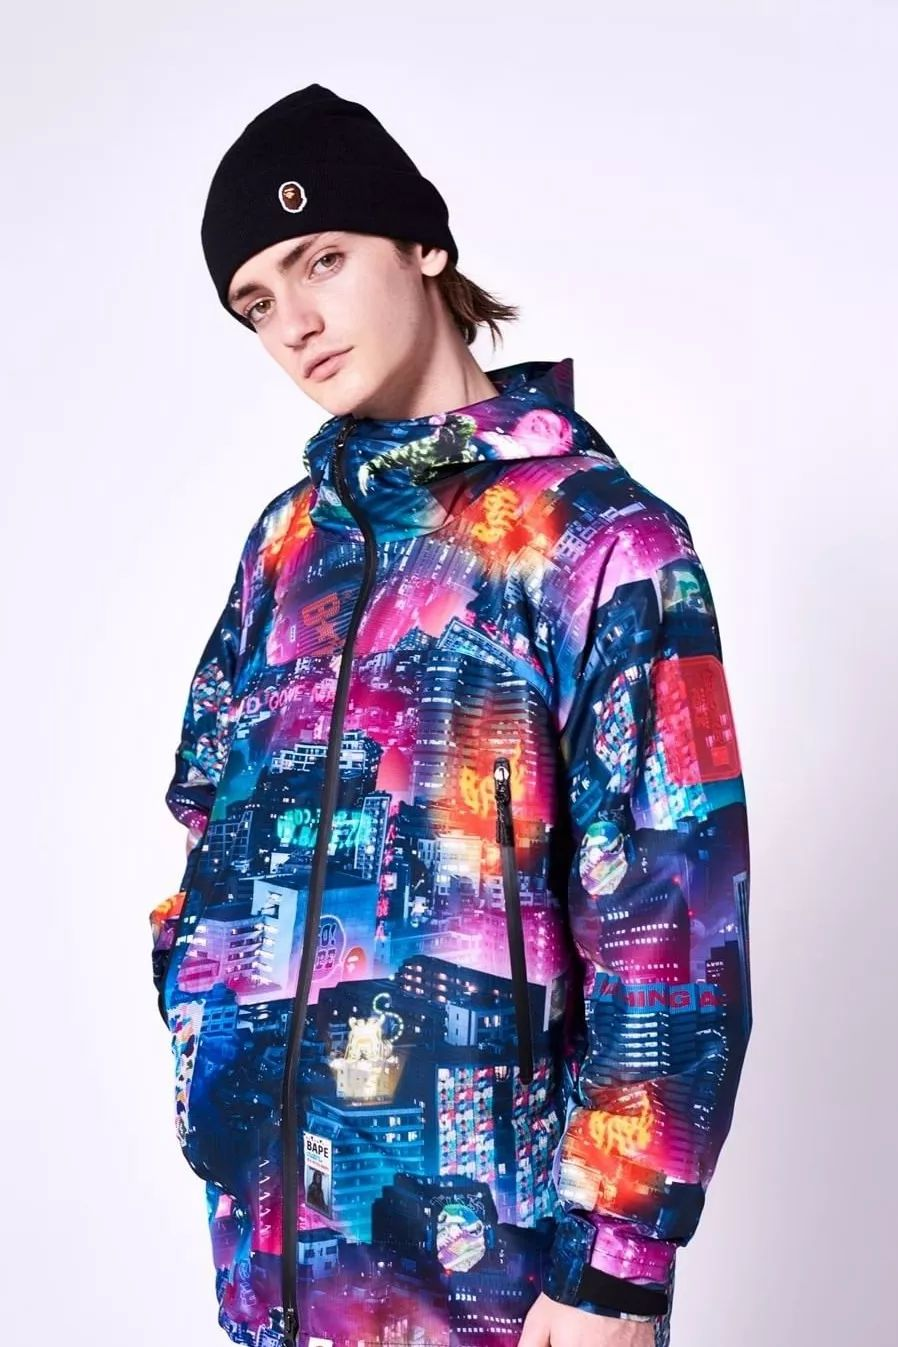 MCM 推出内衣系列   CLOT AF1玫瑰金丝绸或将发售   NBHD x WTAPS预览